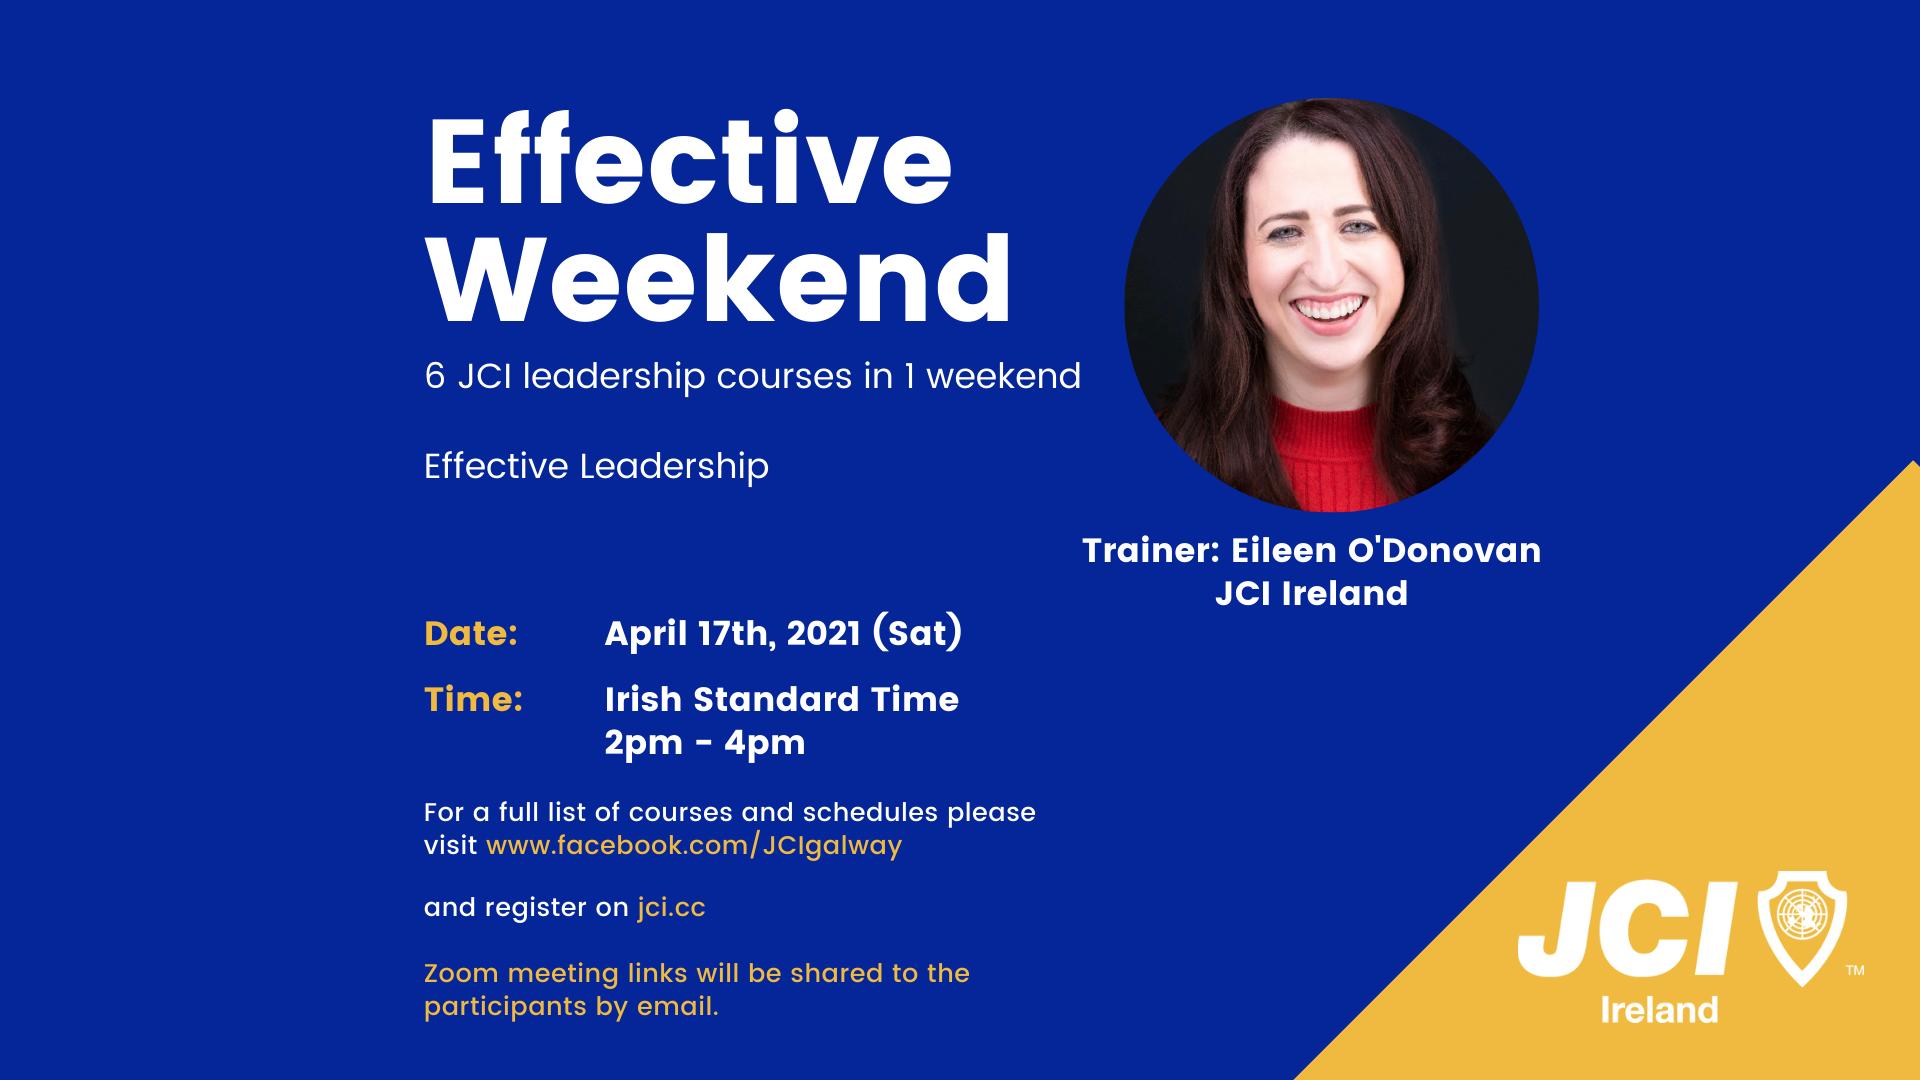 Effective Weekend 2021 - Effective Leadership